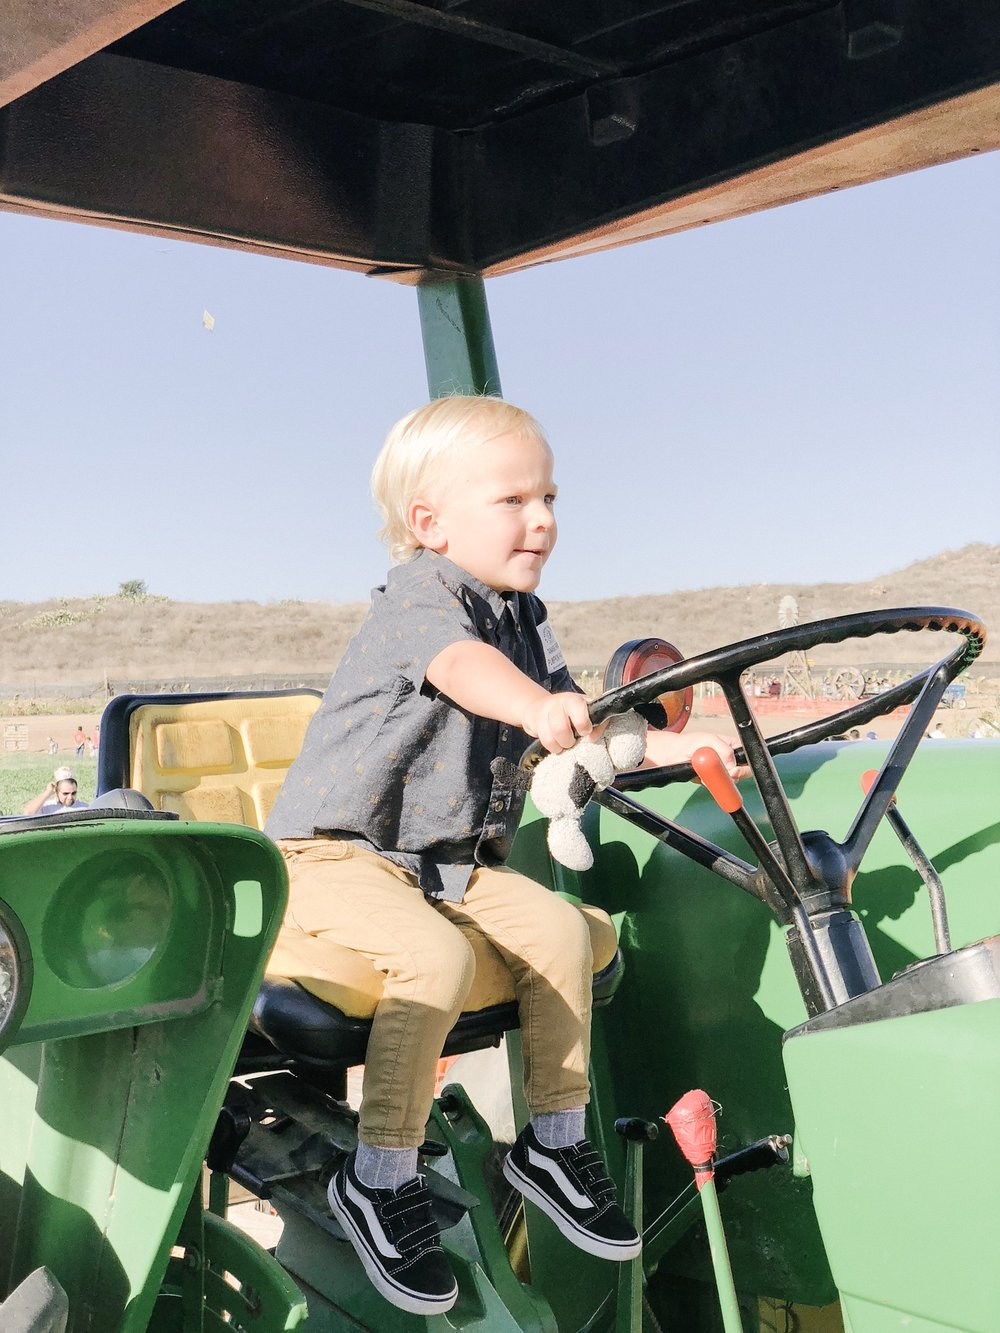 tanaka farms pumpkin patch tractor rides.JPG